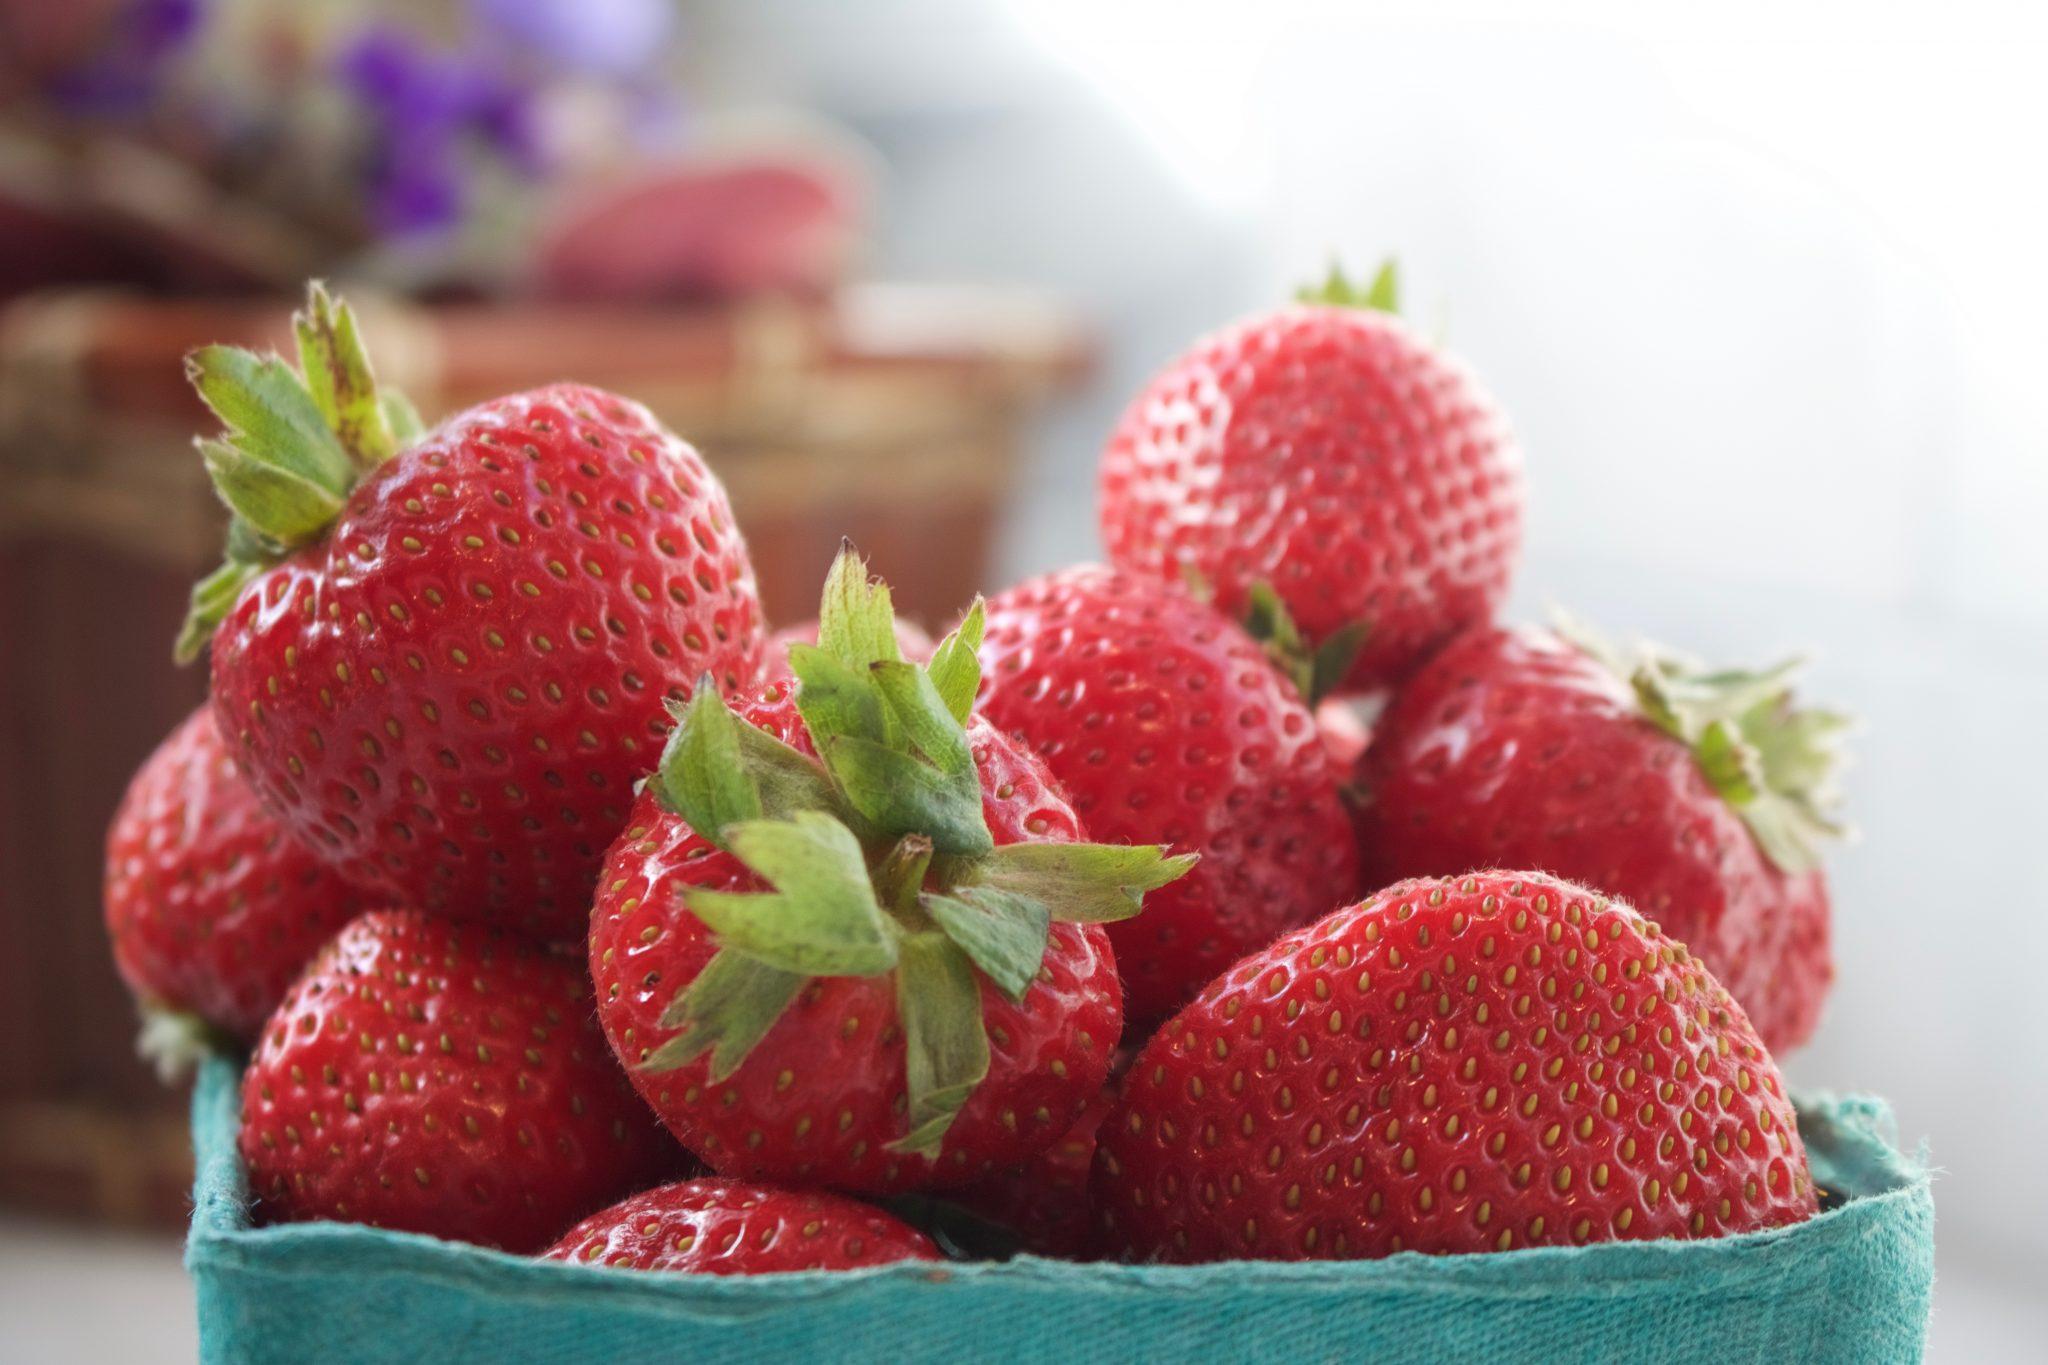 Ripe Red Fresh Whole Strawberries